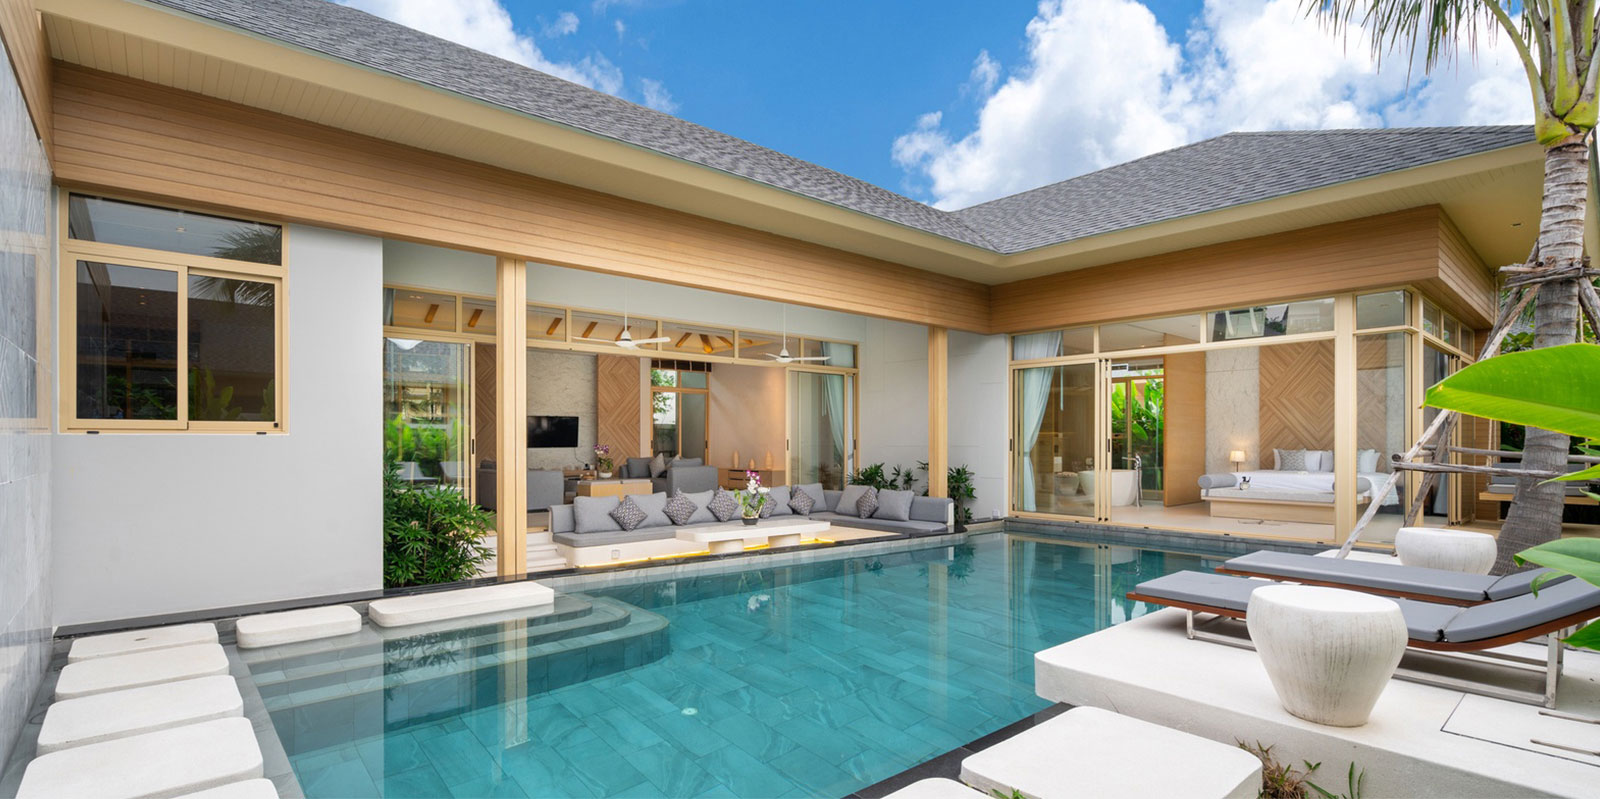 Winter Garden FL Homes for Sale | Peggy Dearing, Realtor